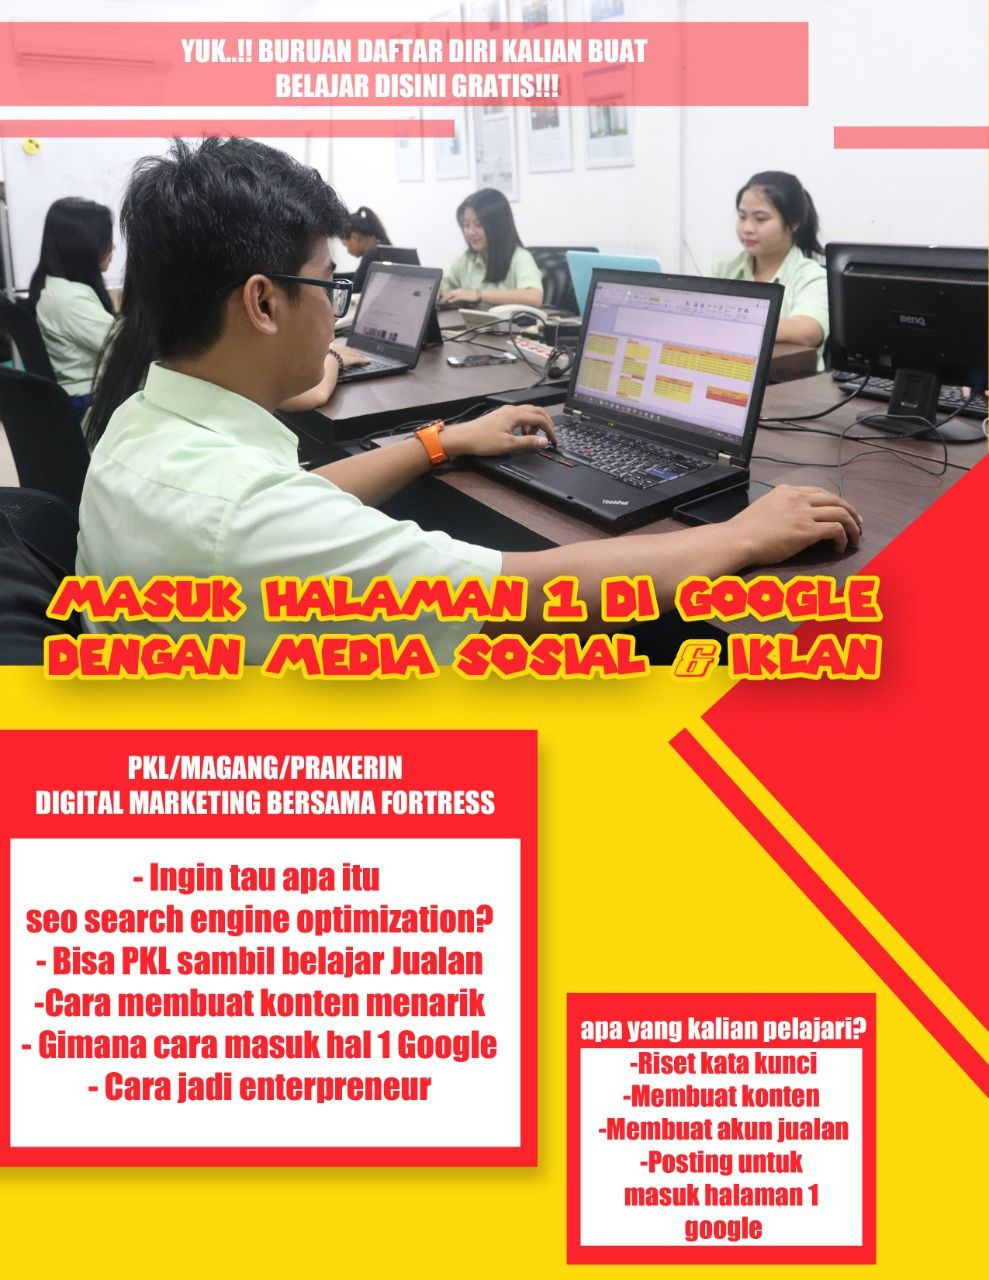 Tempat Pkl Multimedia Jakarta Daerah Khusus Ibukota ...